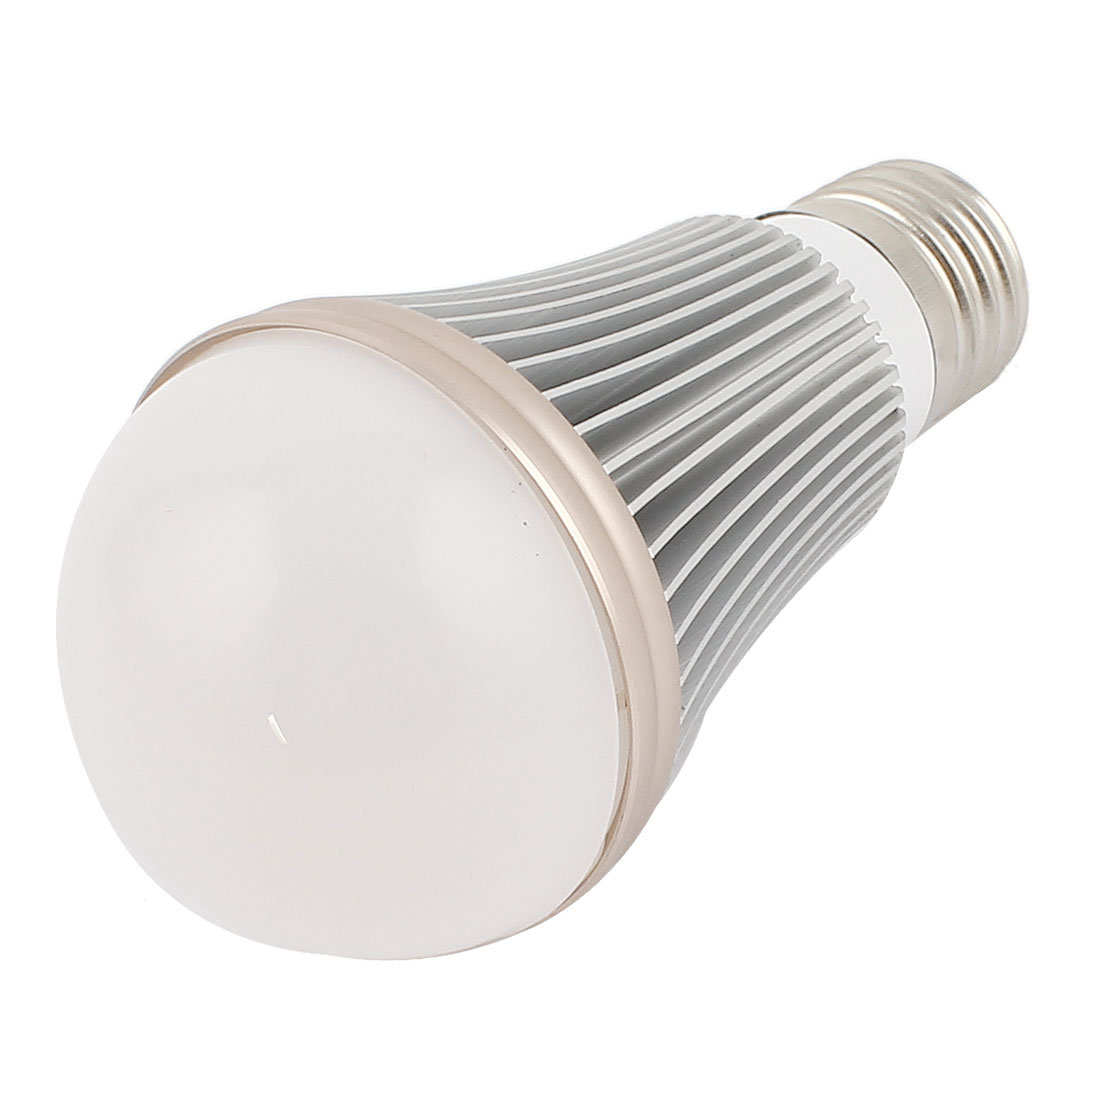 7W Silver Tone E27 60mm Dia Globe Ball Bulb Lamp Shell LED Aluminum Heatsink